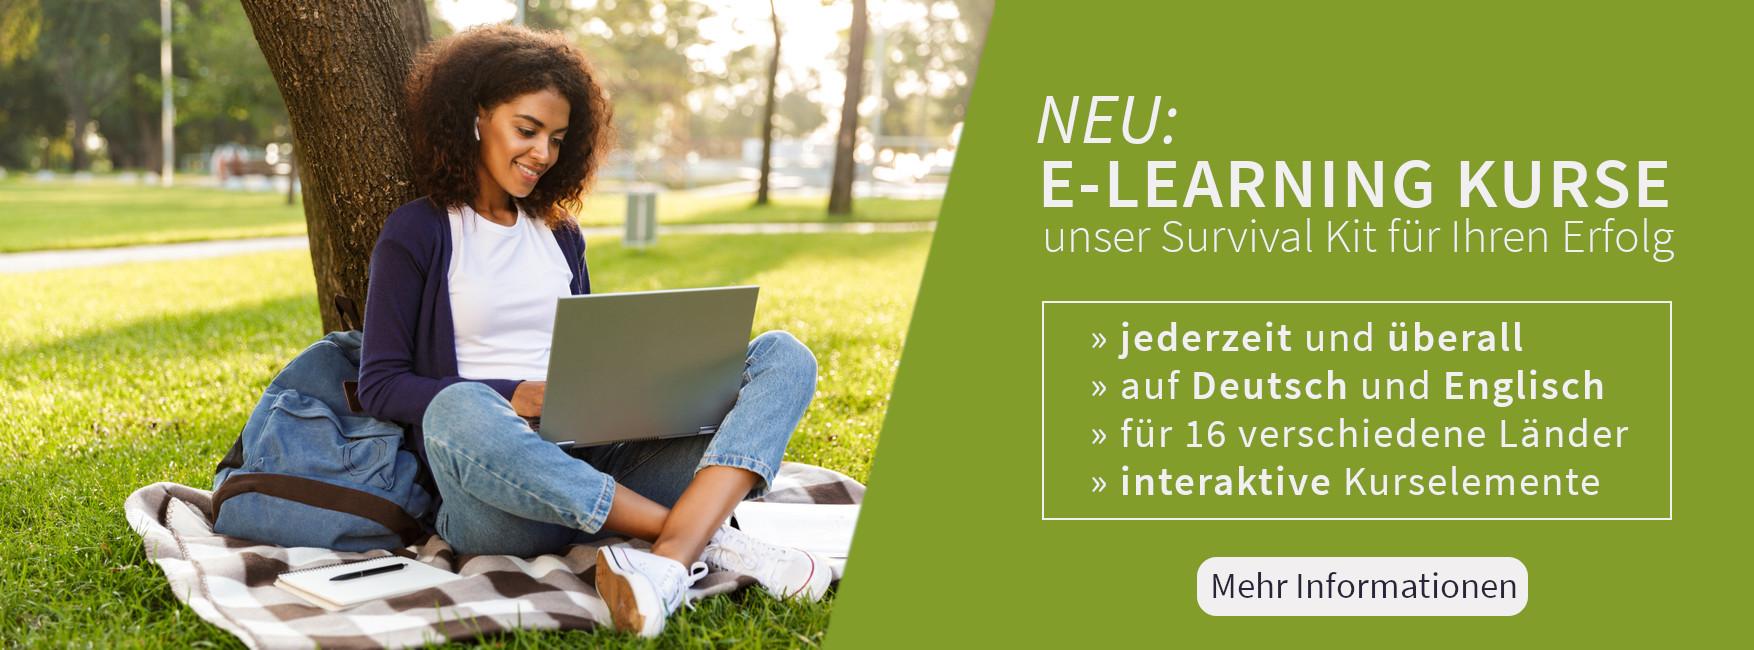 Unsere neuen E-Learning Kurse sind online